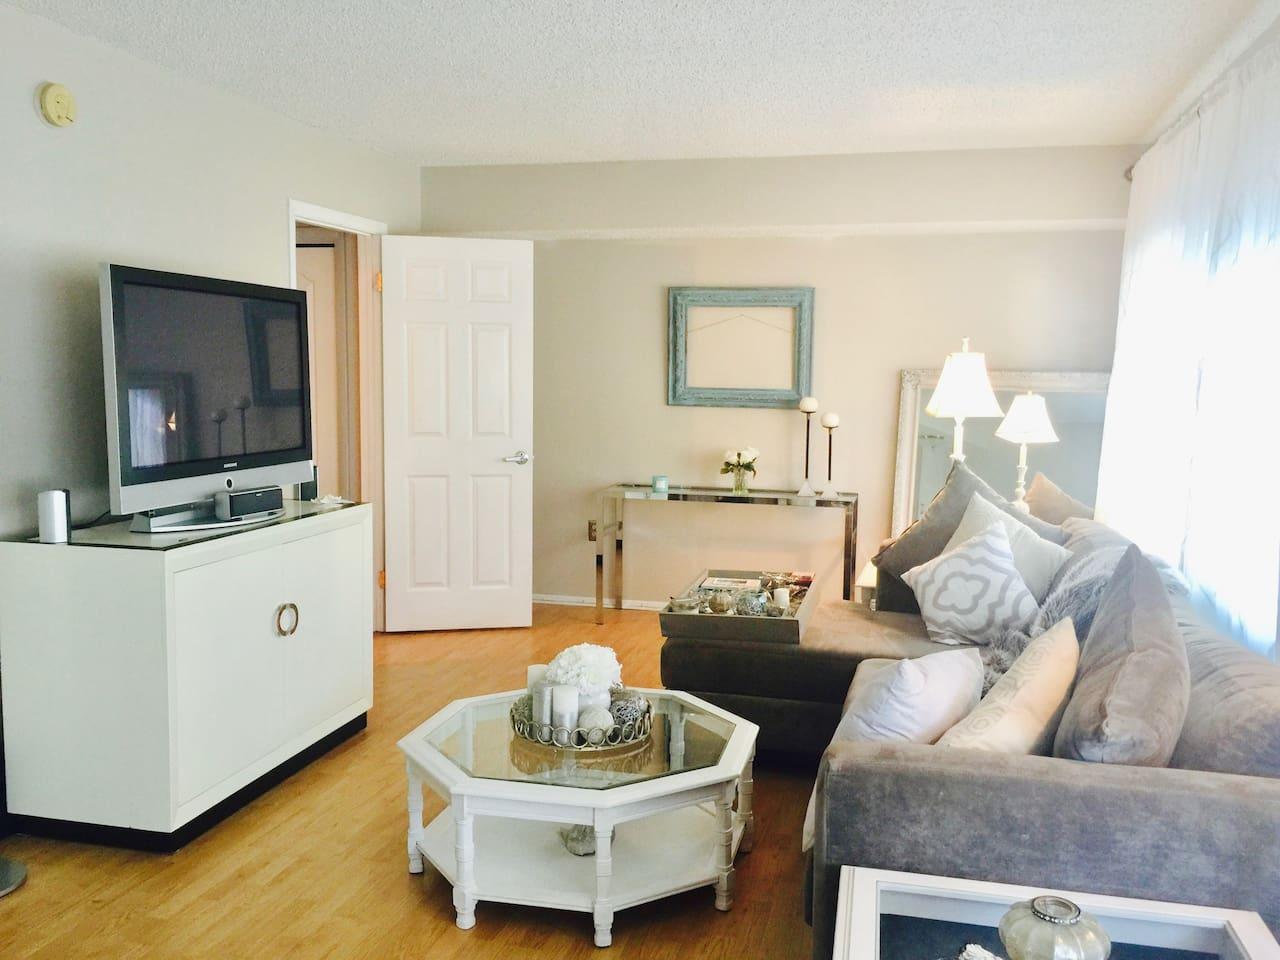 Modern condo in Dunedin - Apartments for Rent in Dunedin, Florida ...